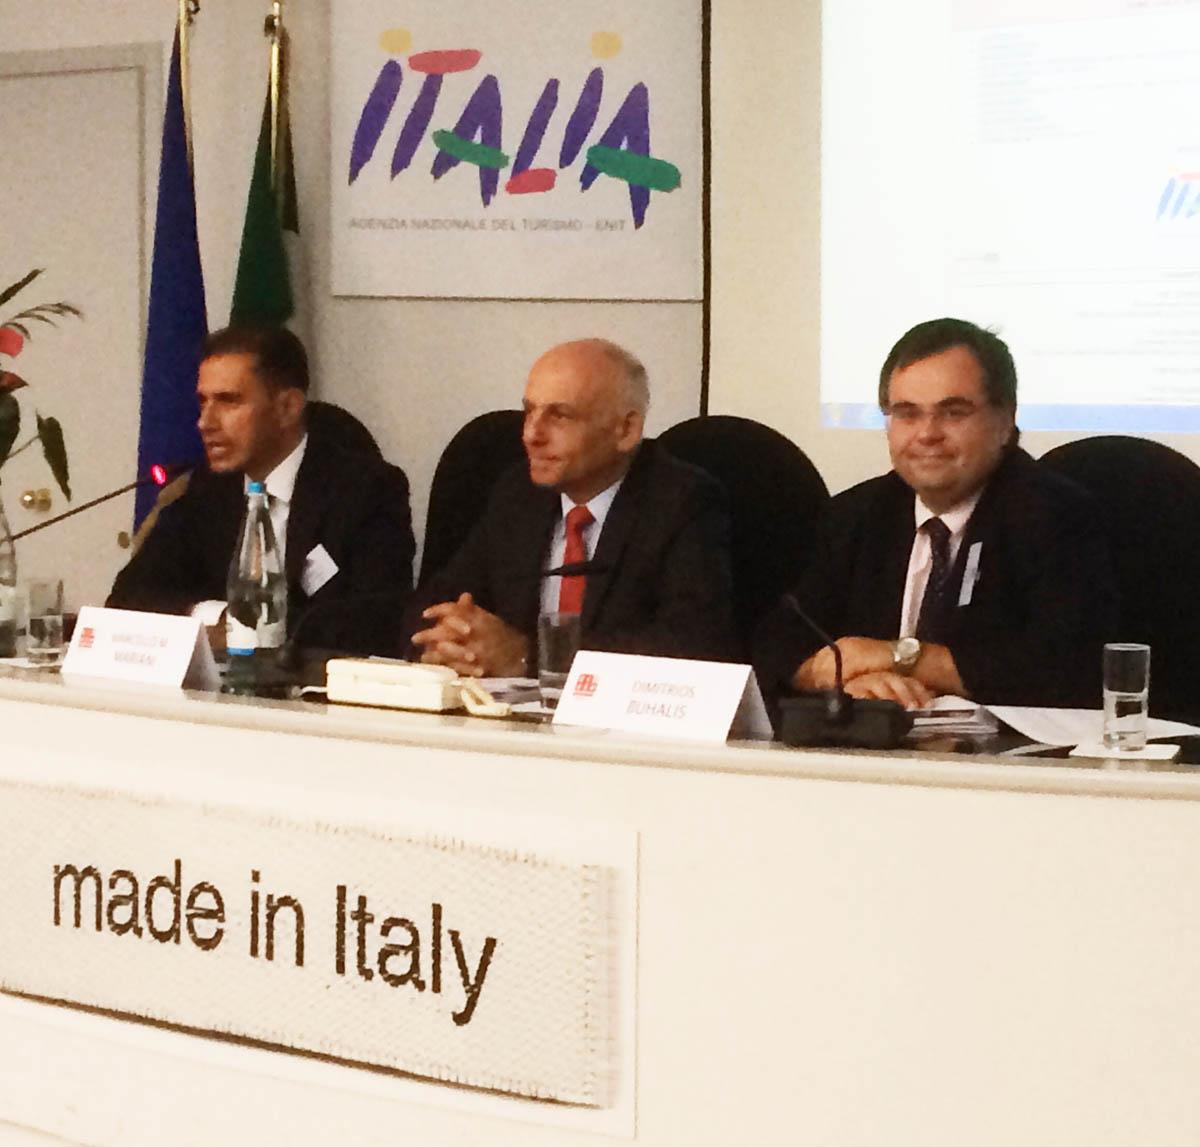 Buhalis ItalyPanel